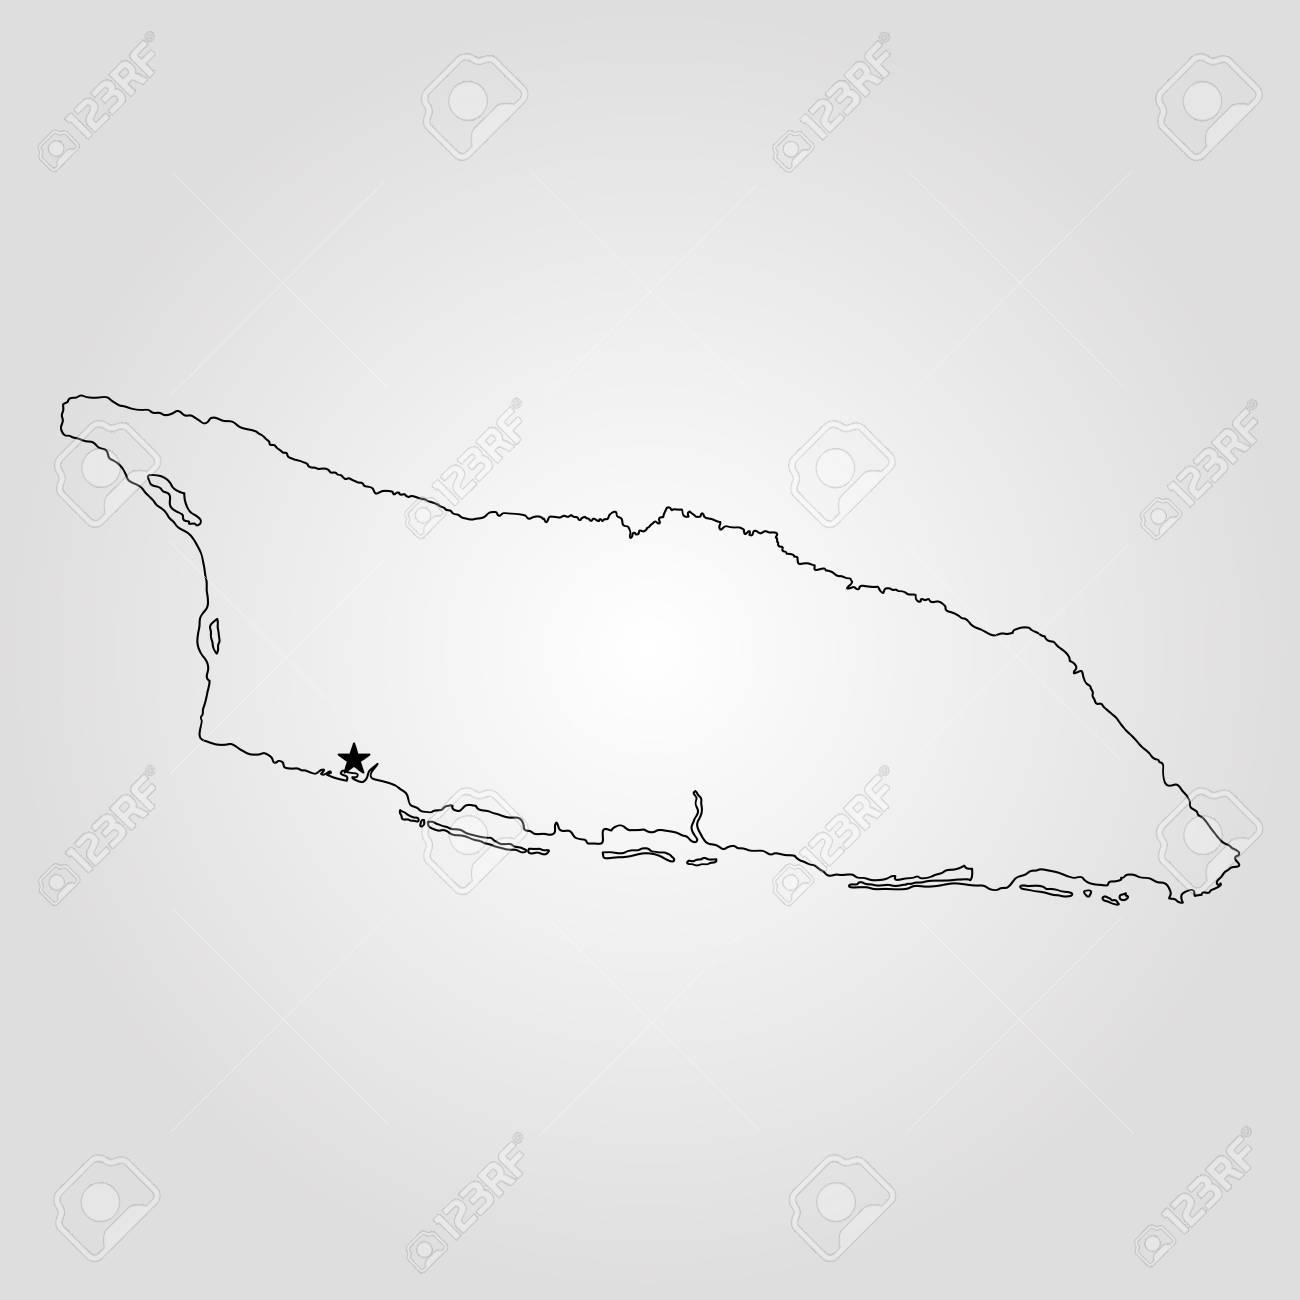 Map Of Aruba Vector Illustration World Map Royalty Free Cliparts